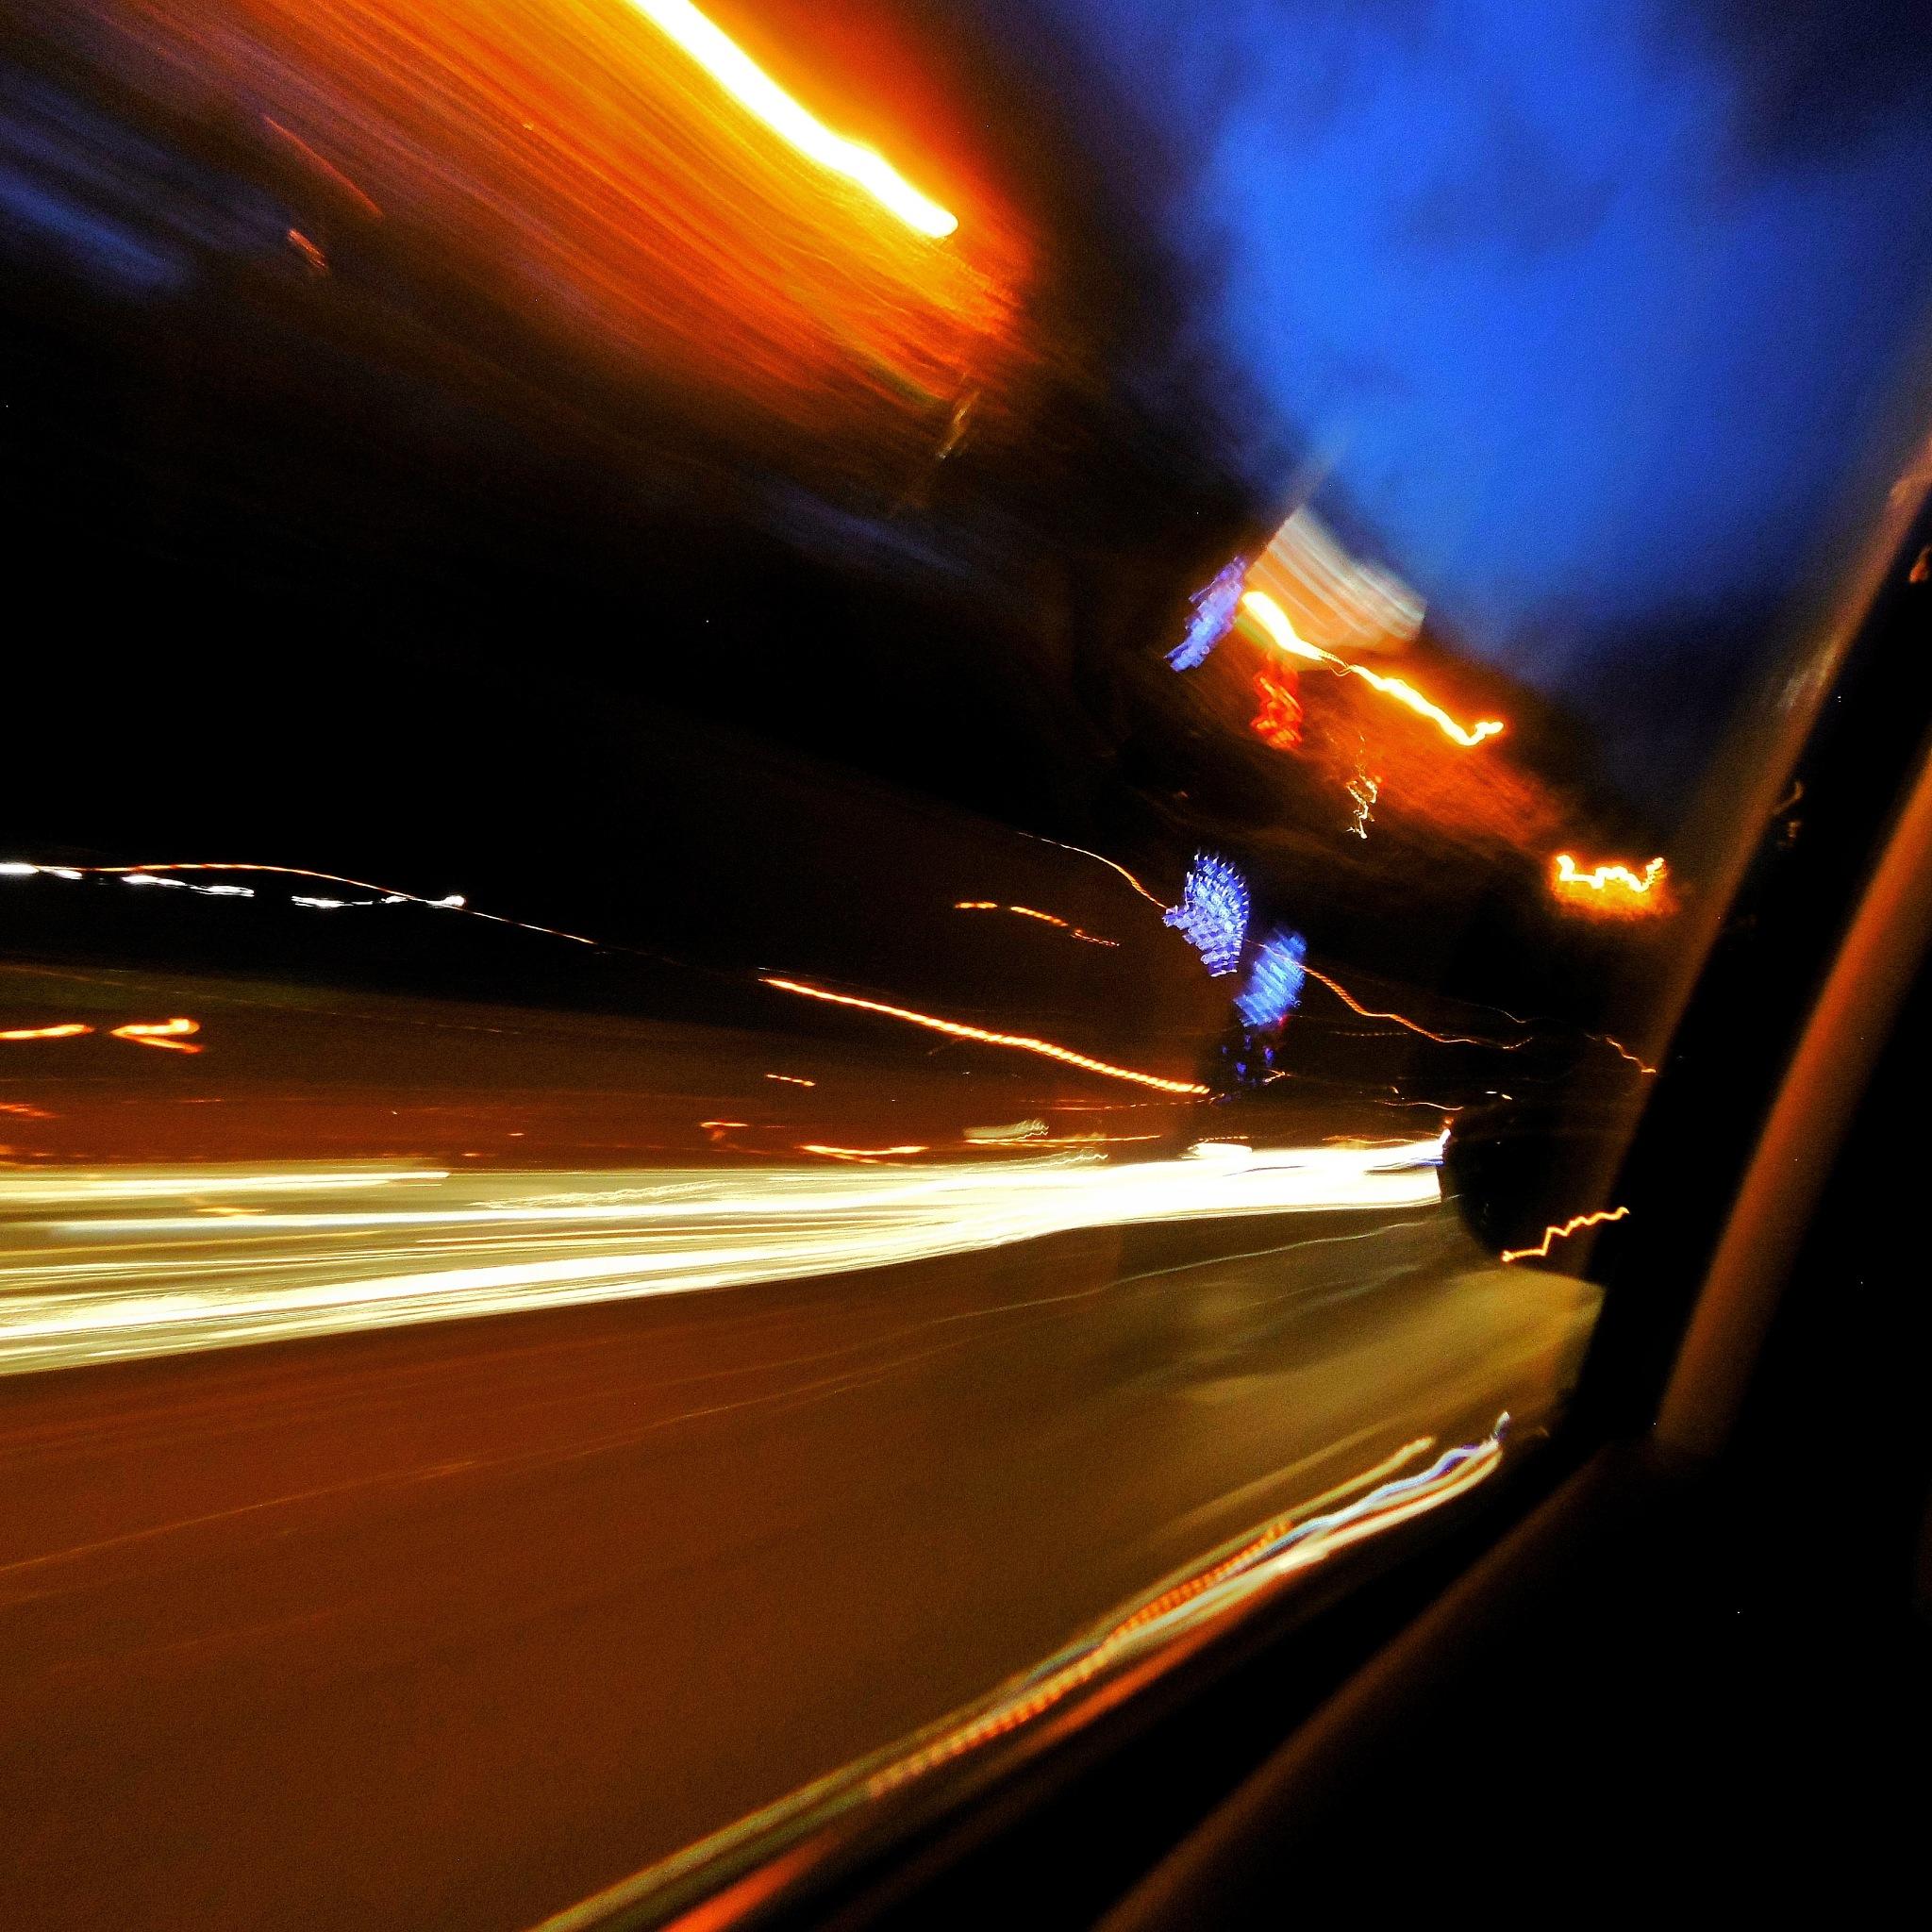 In The Car  by Renaicon Solitaire